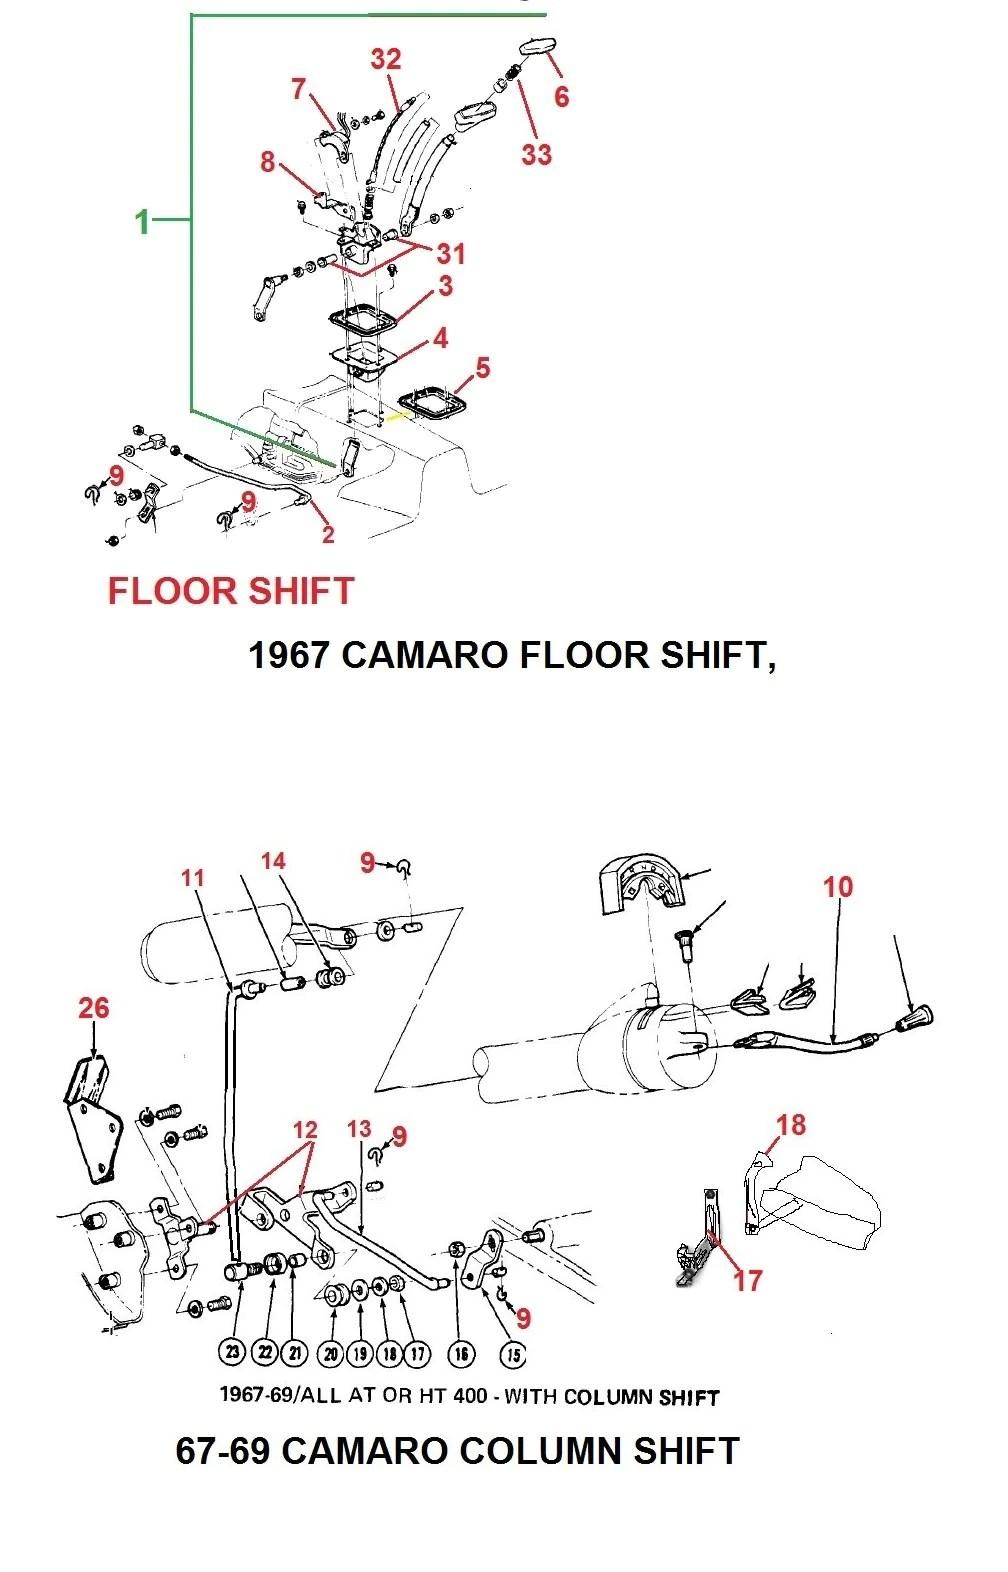 small resolution of 1967 camaro auto floor shifter 67 69 camaro column shift parts